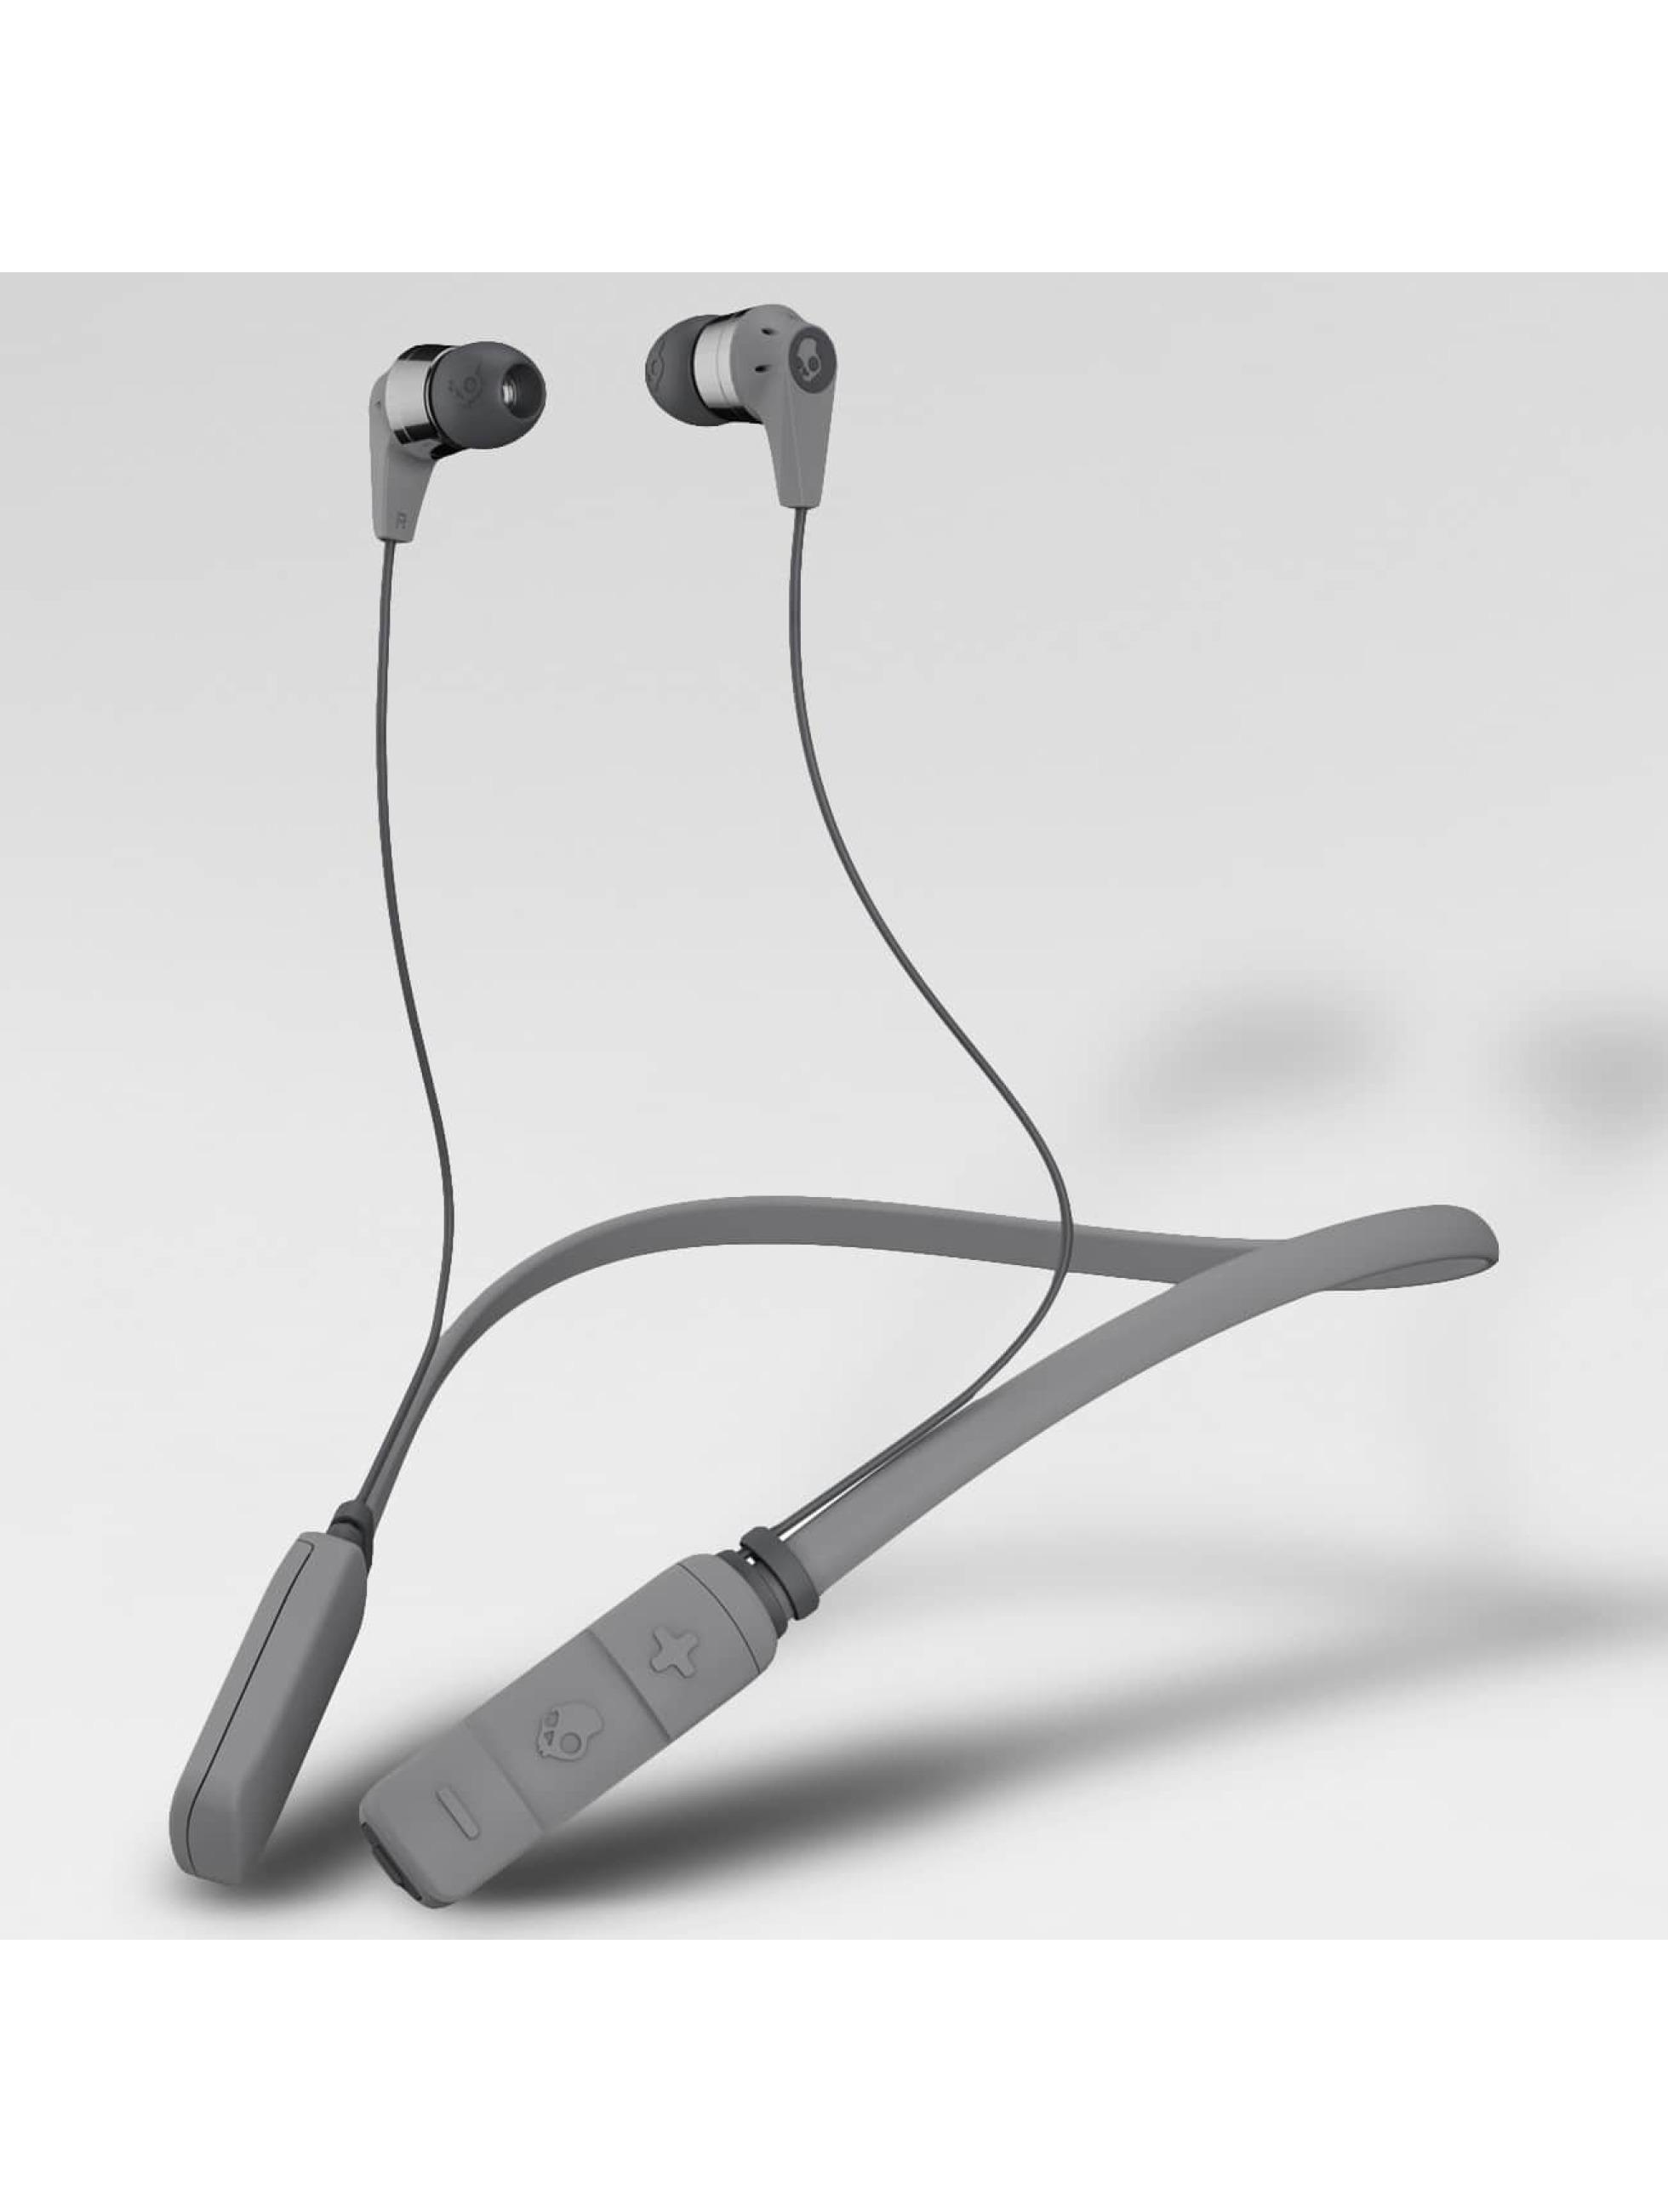 Skullcandy Sluchátka Ink'd 2.0 Wireless In šedá